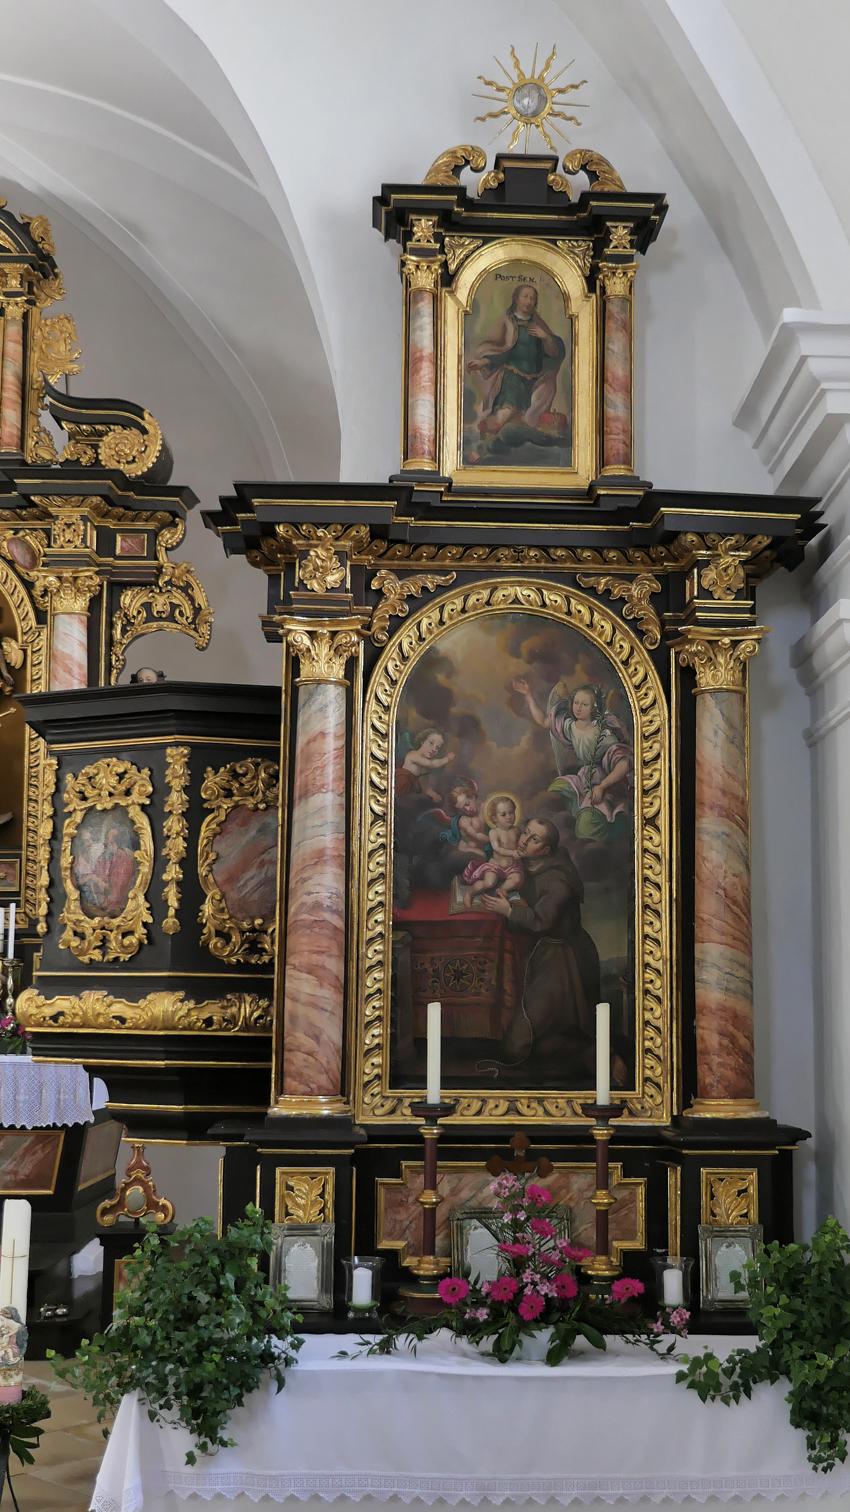 2021 04 26 aoelfb wallfahrtskirche mariae himmelfahrt atzberg14